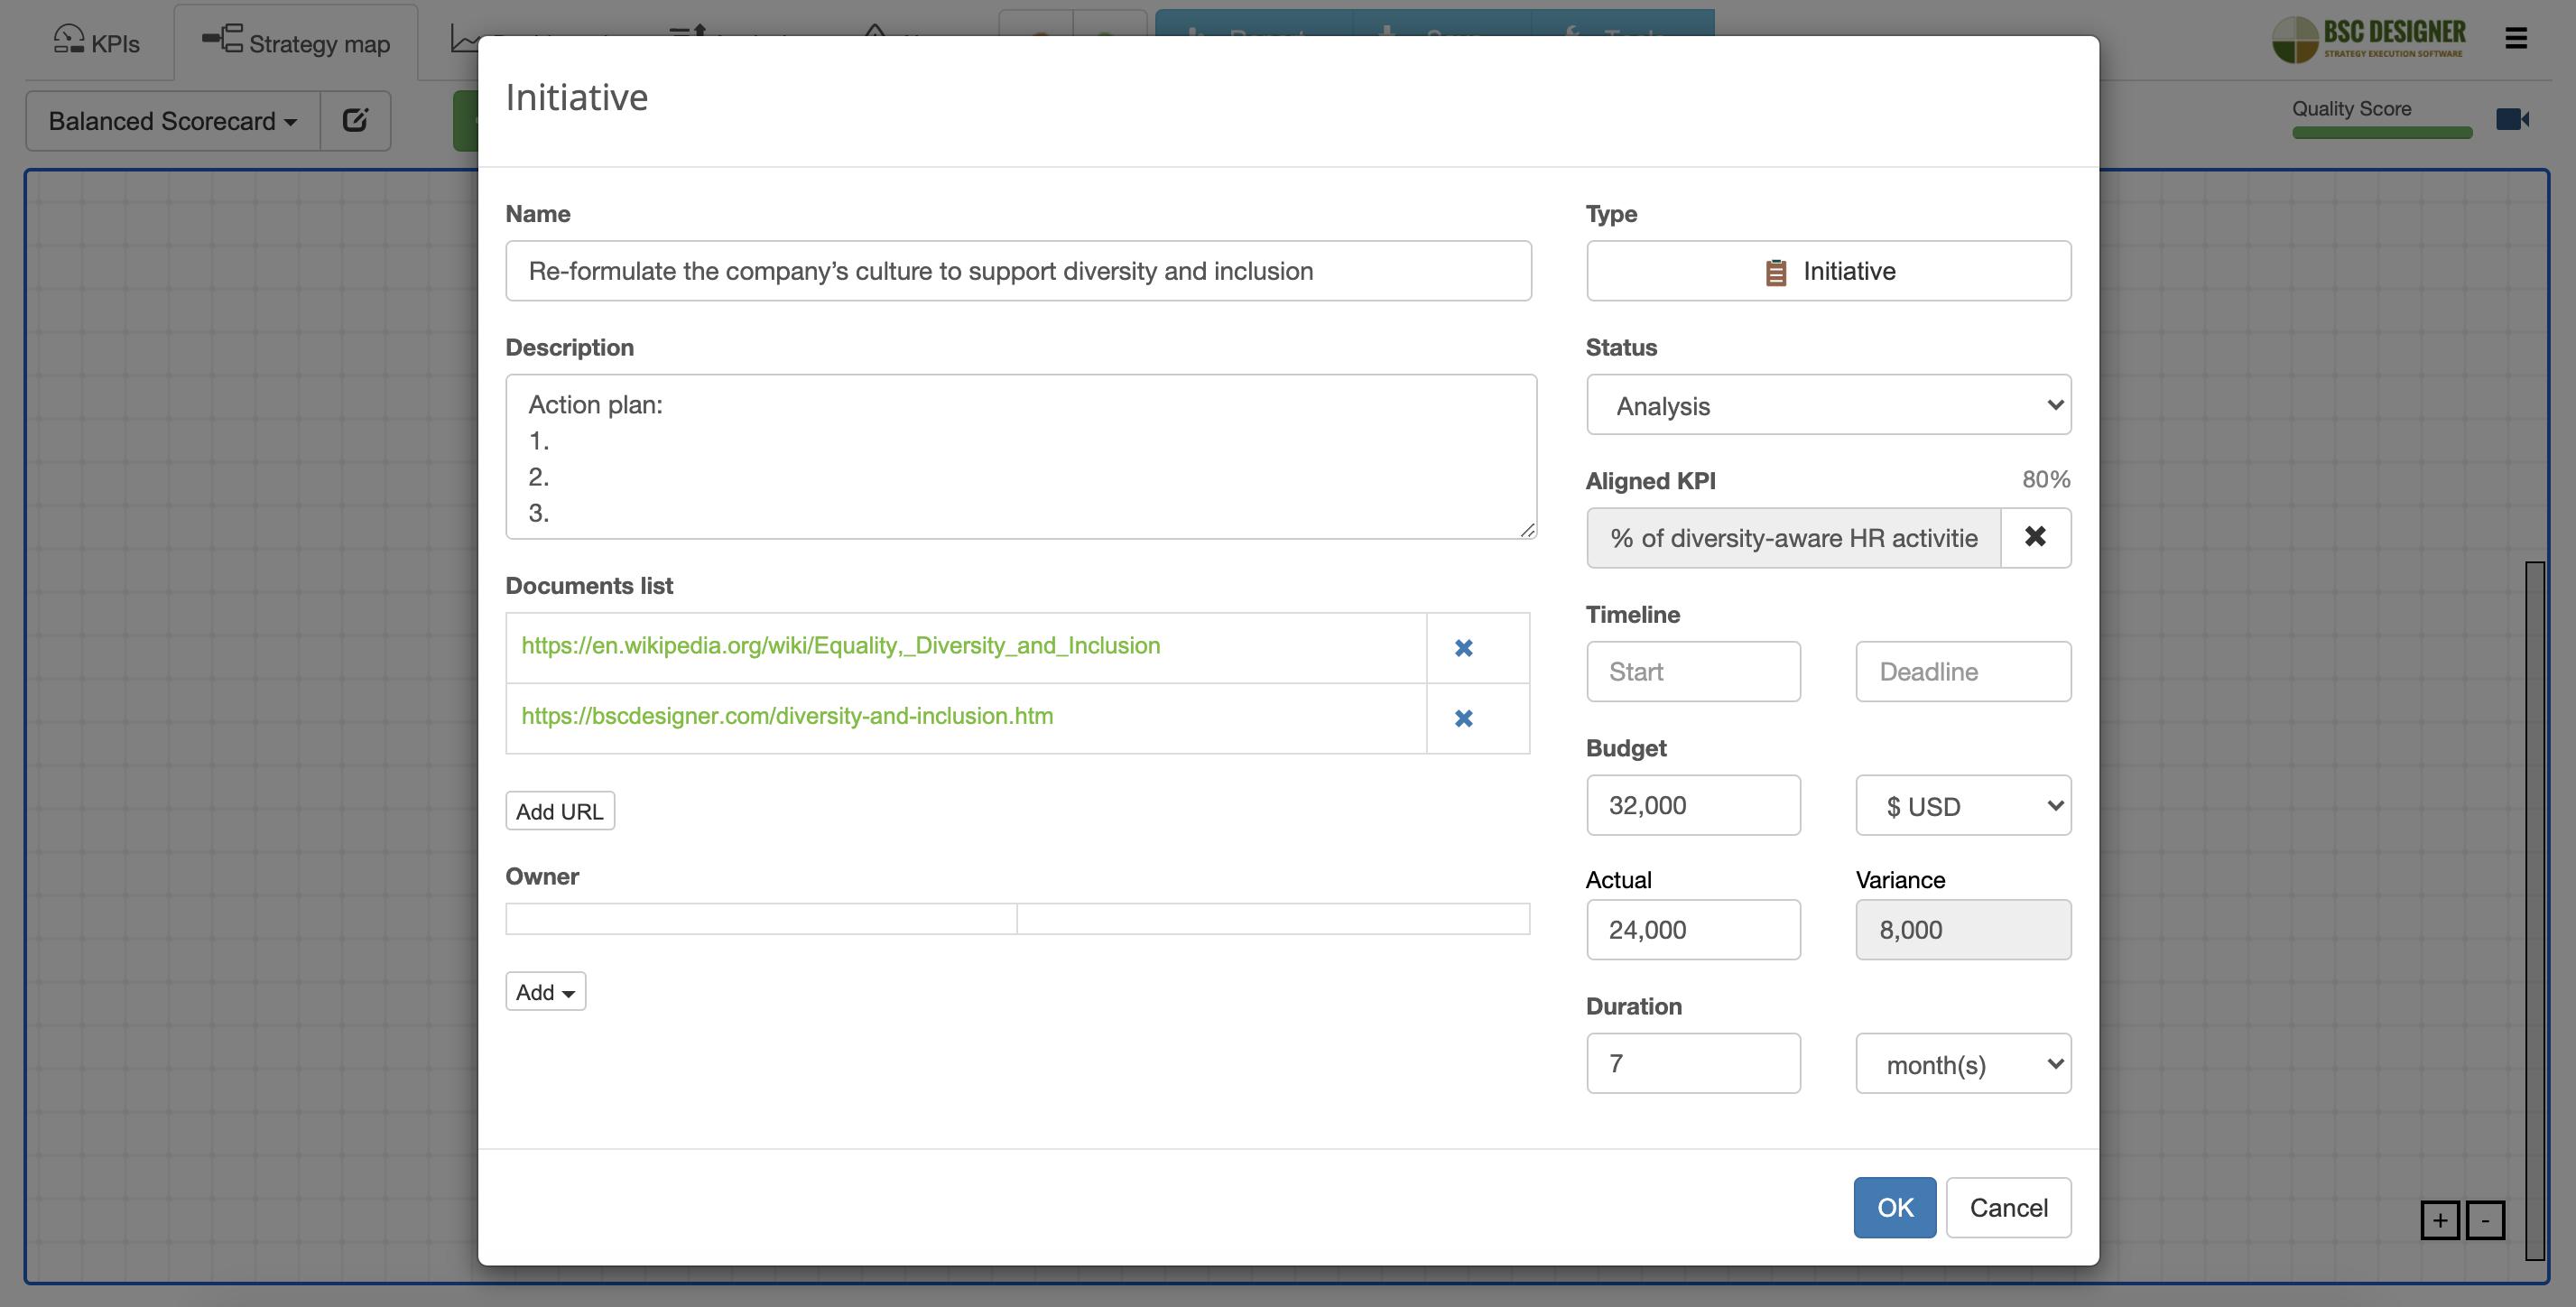 Initiative in BSC Designer software: status, budget, timeline